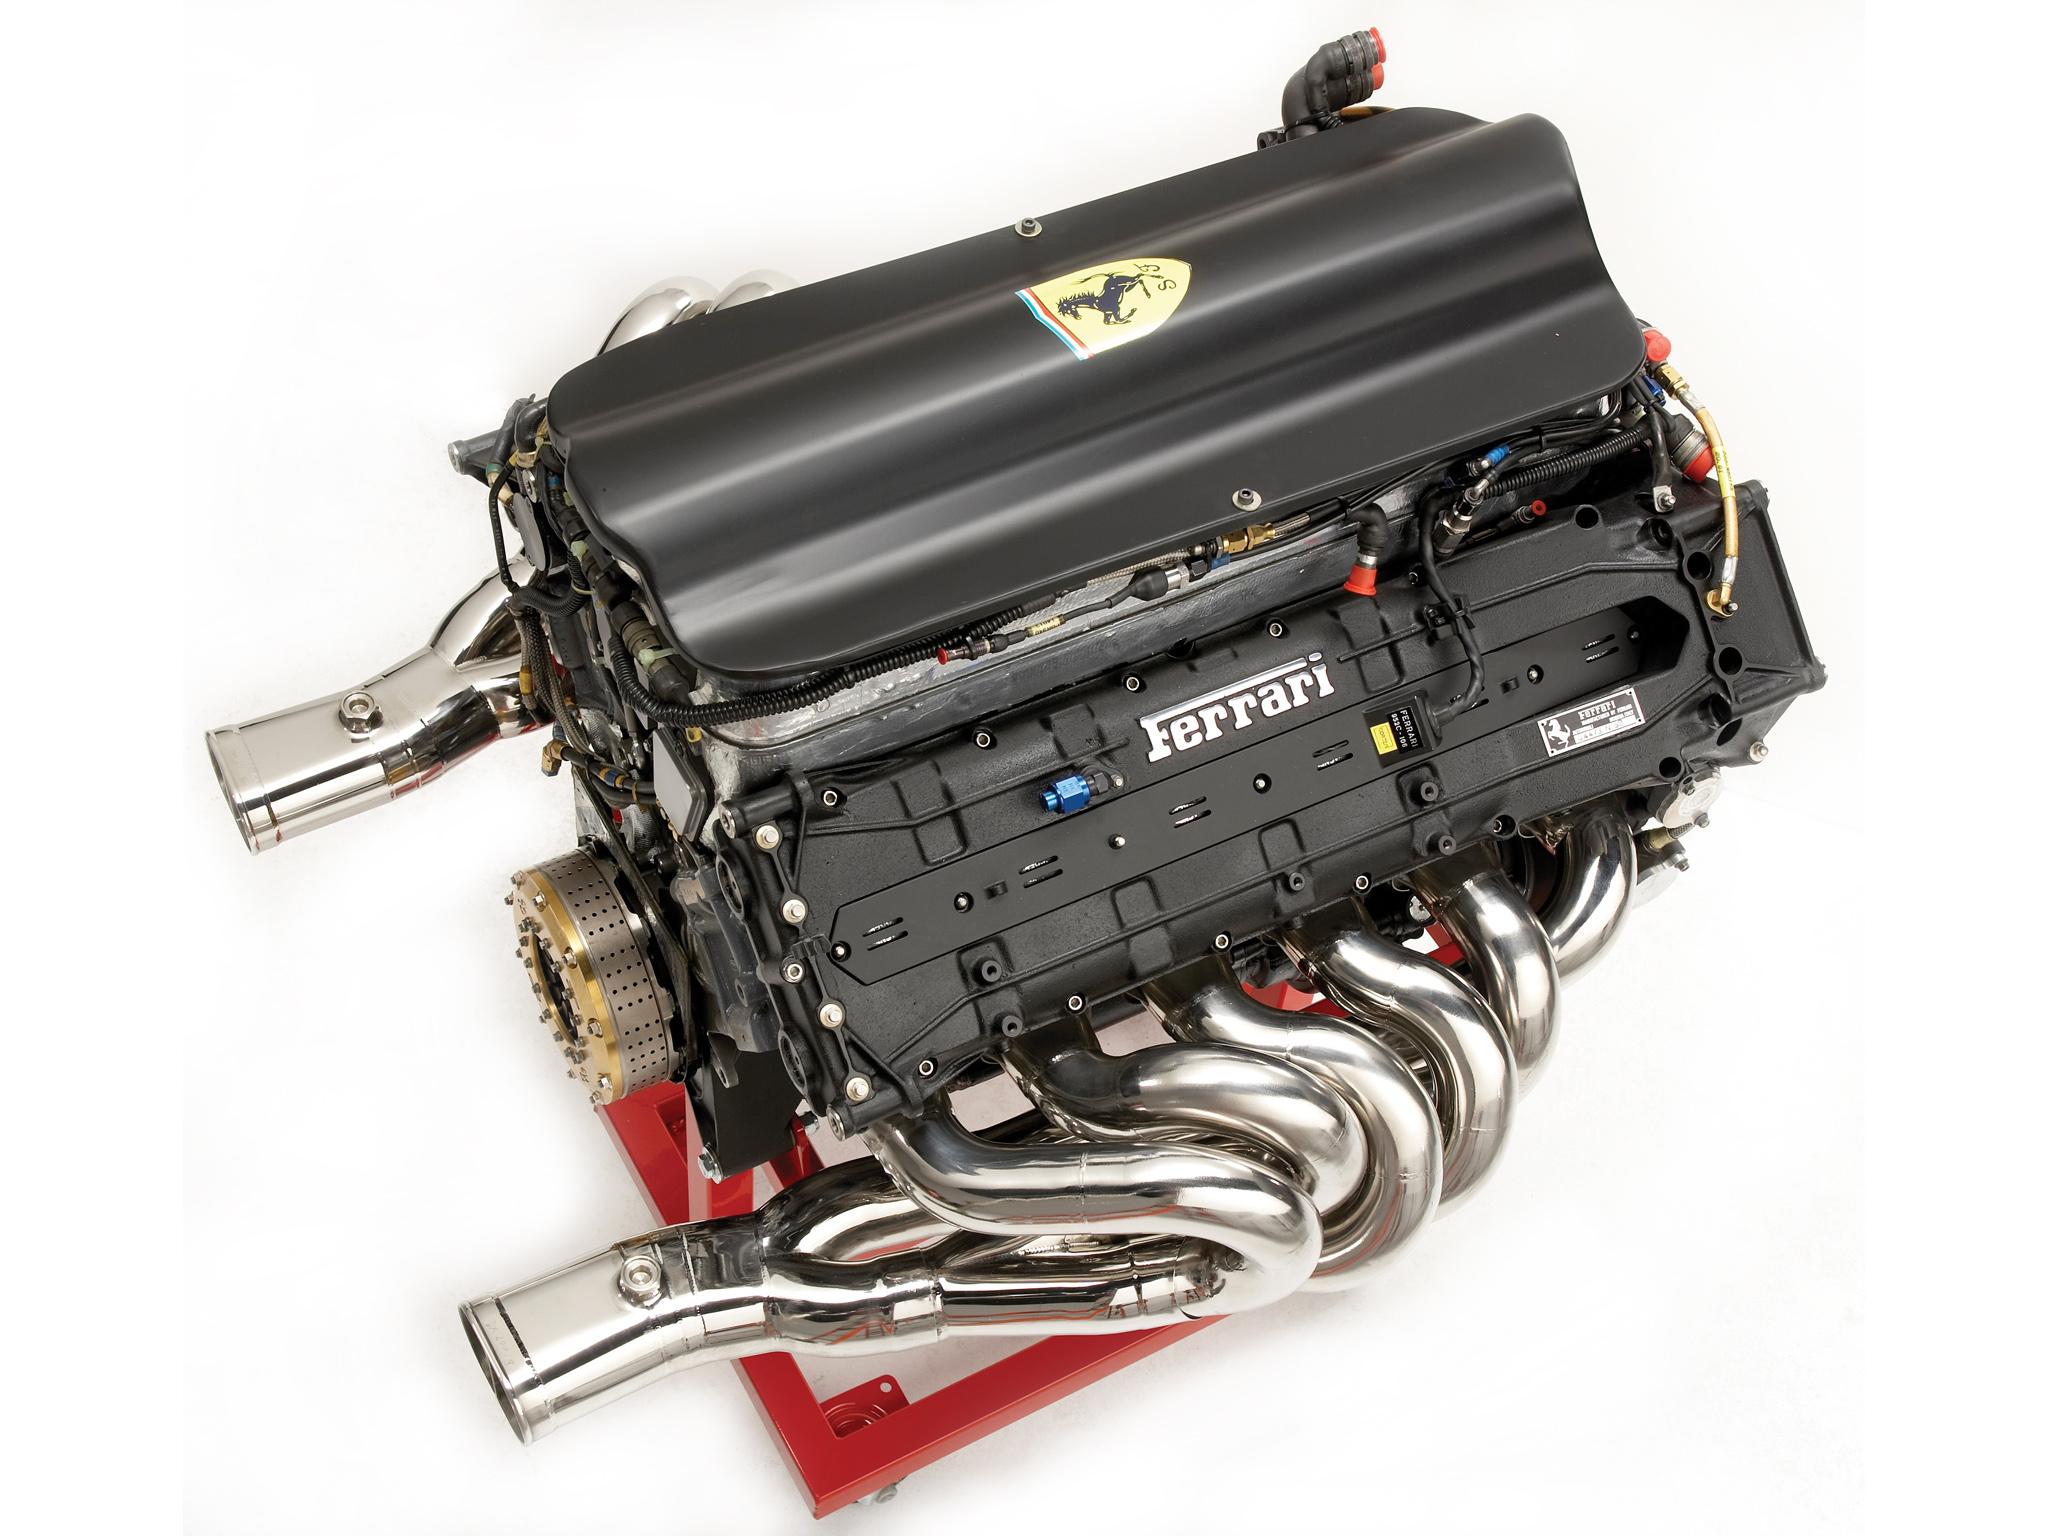 f1 engine wallpaper - photo #41